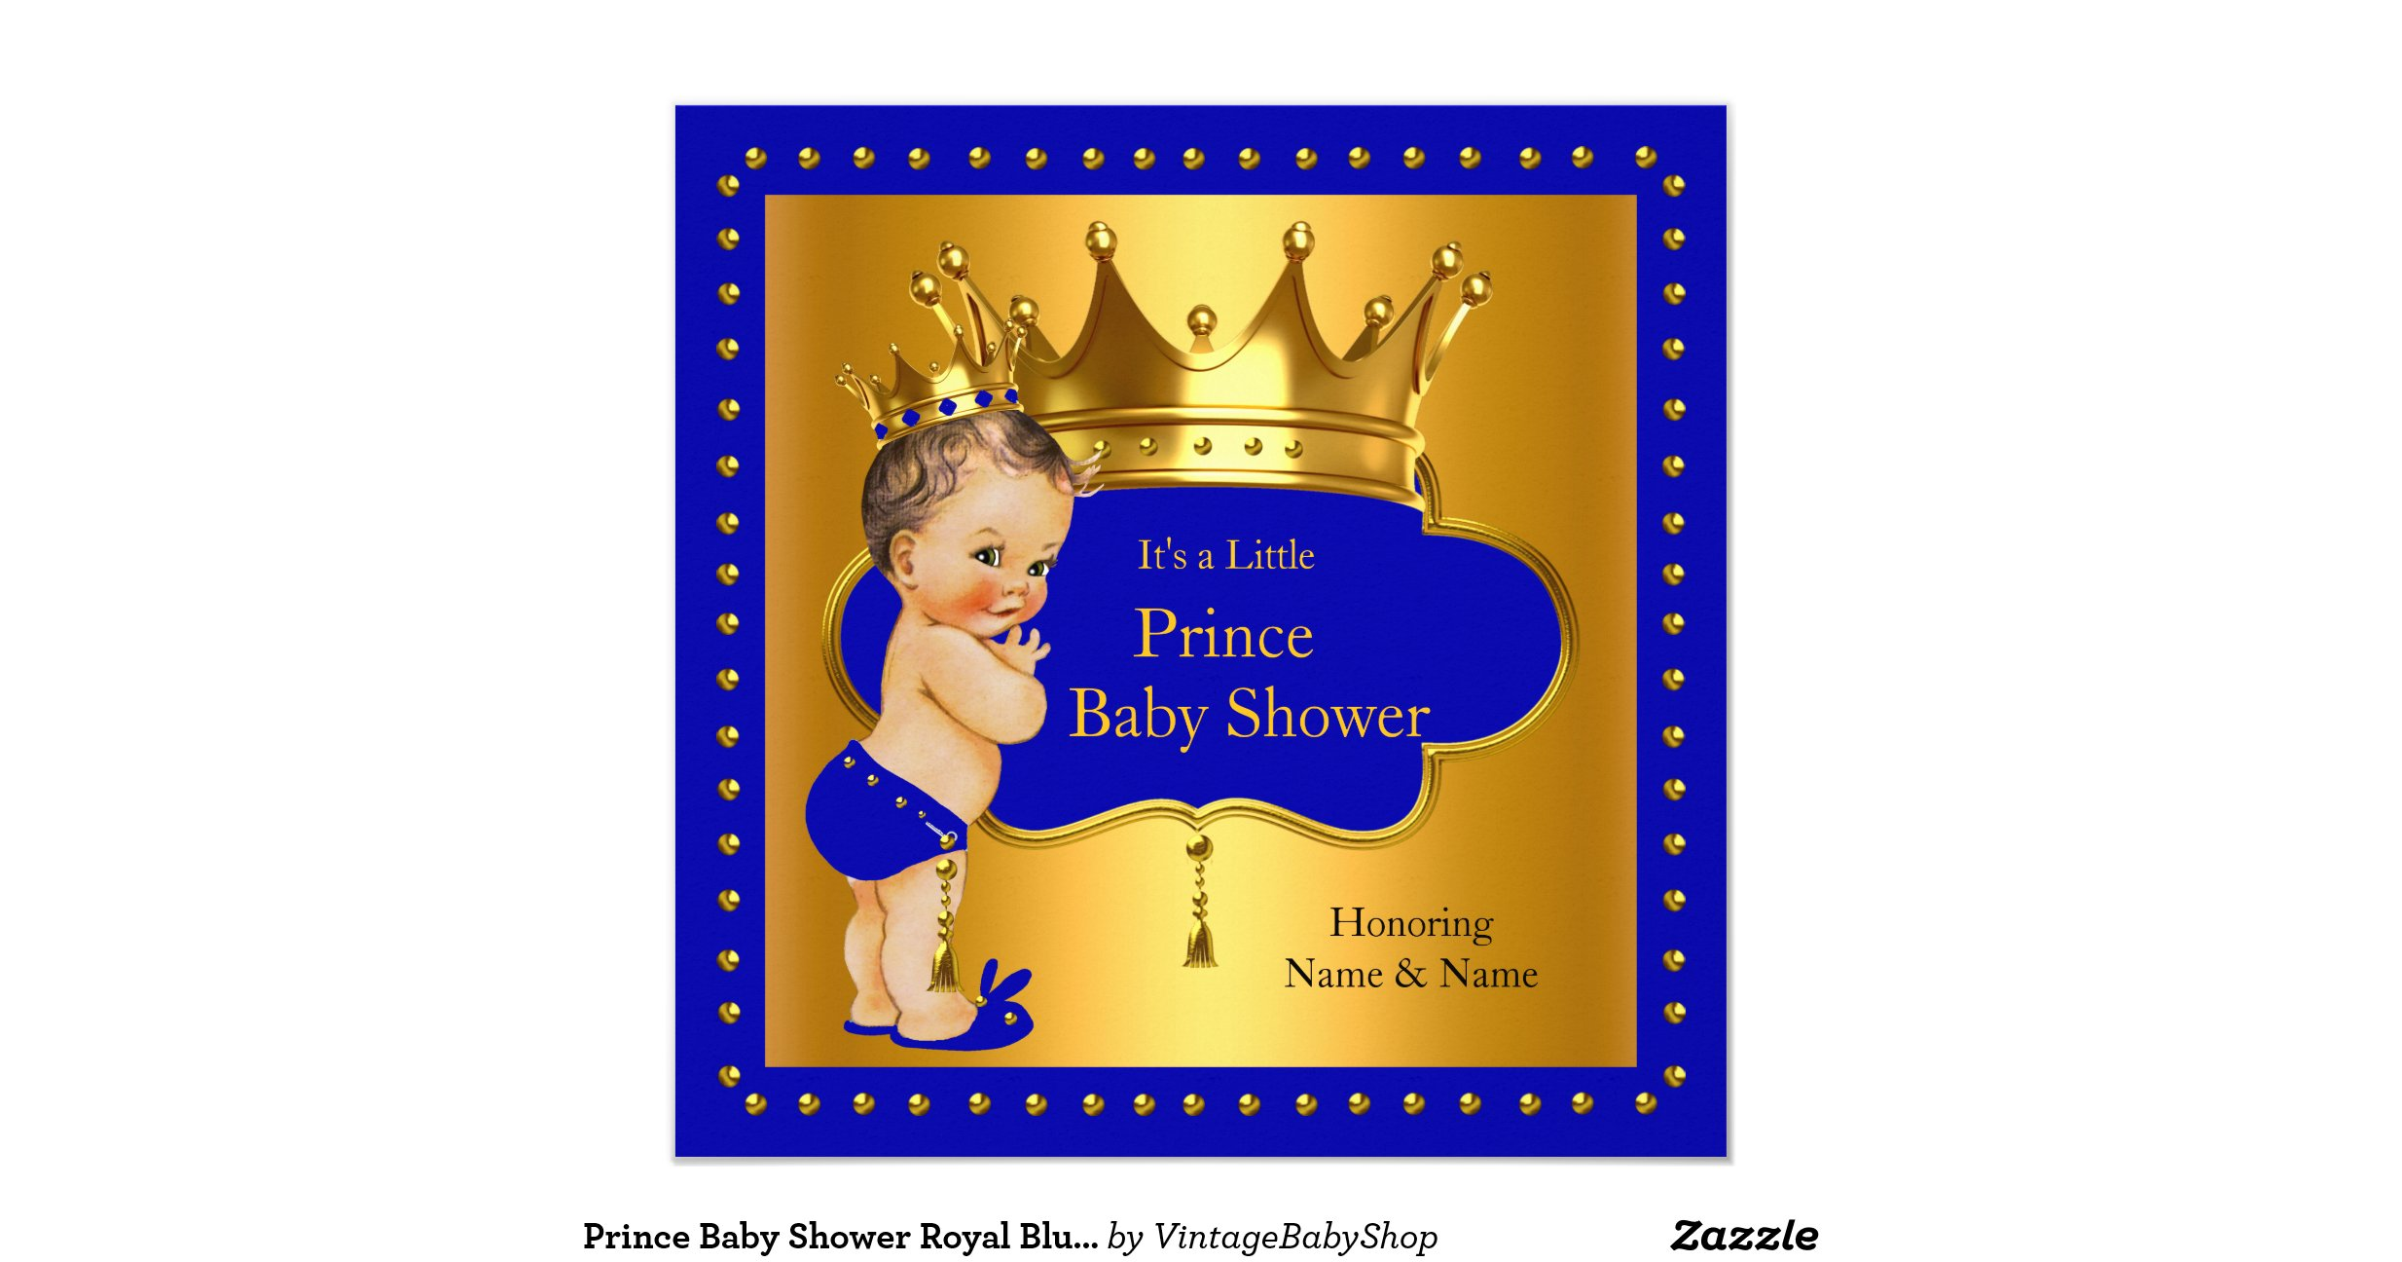 prince baby shower royal blue boy crown invitation